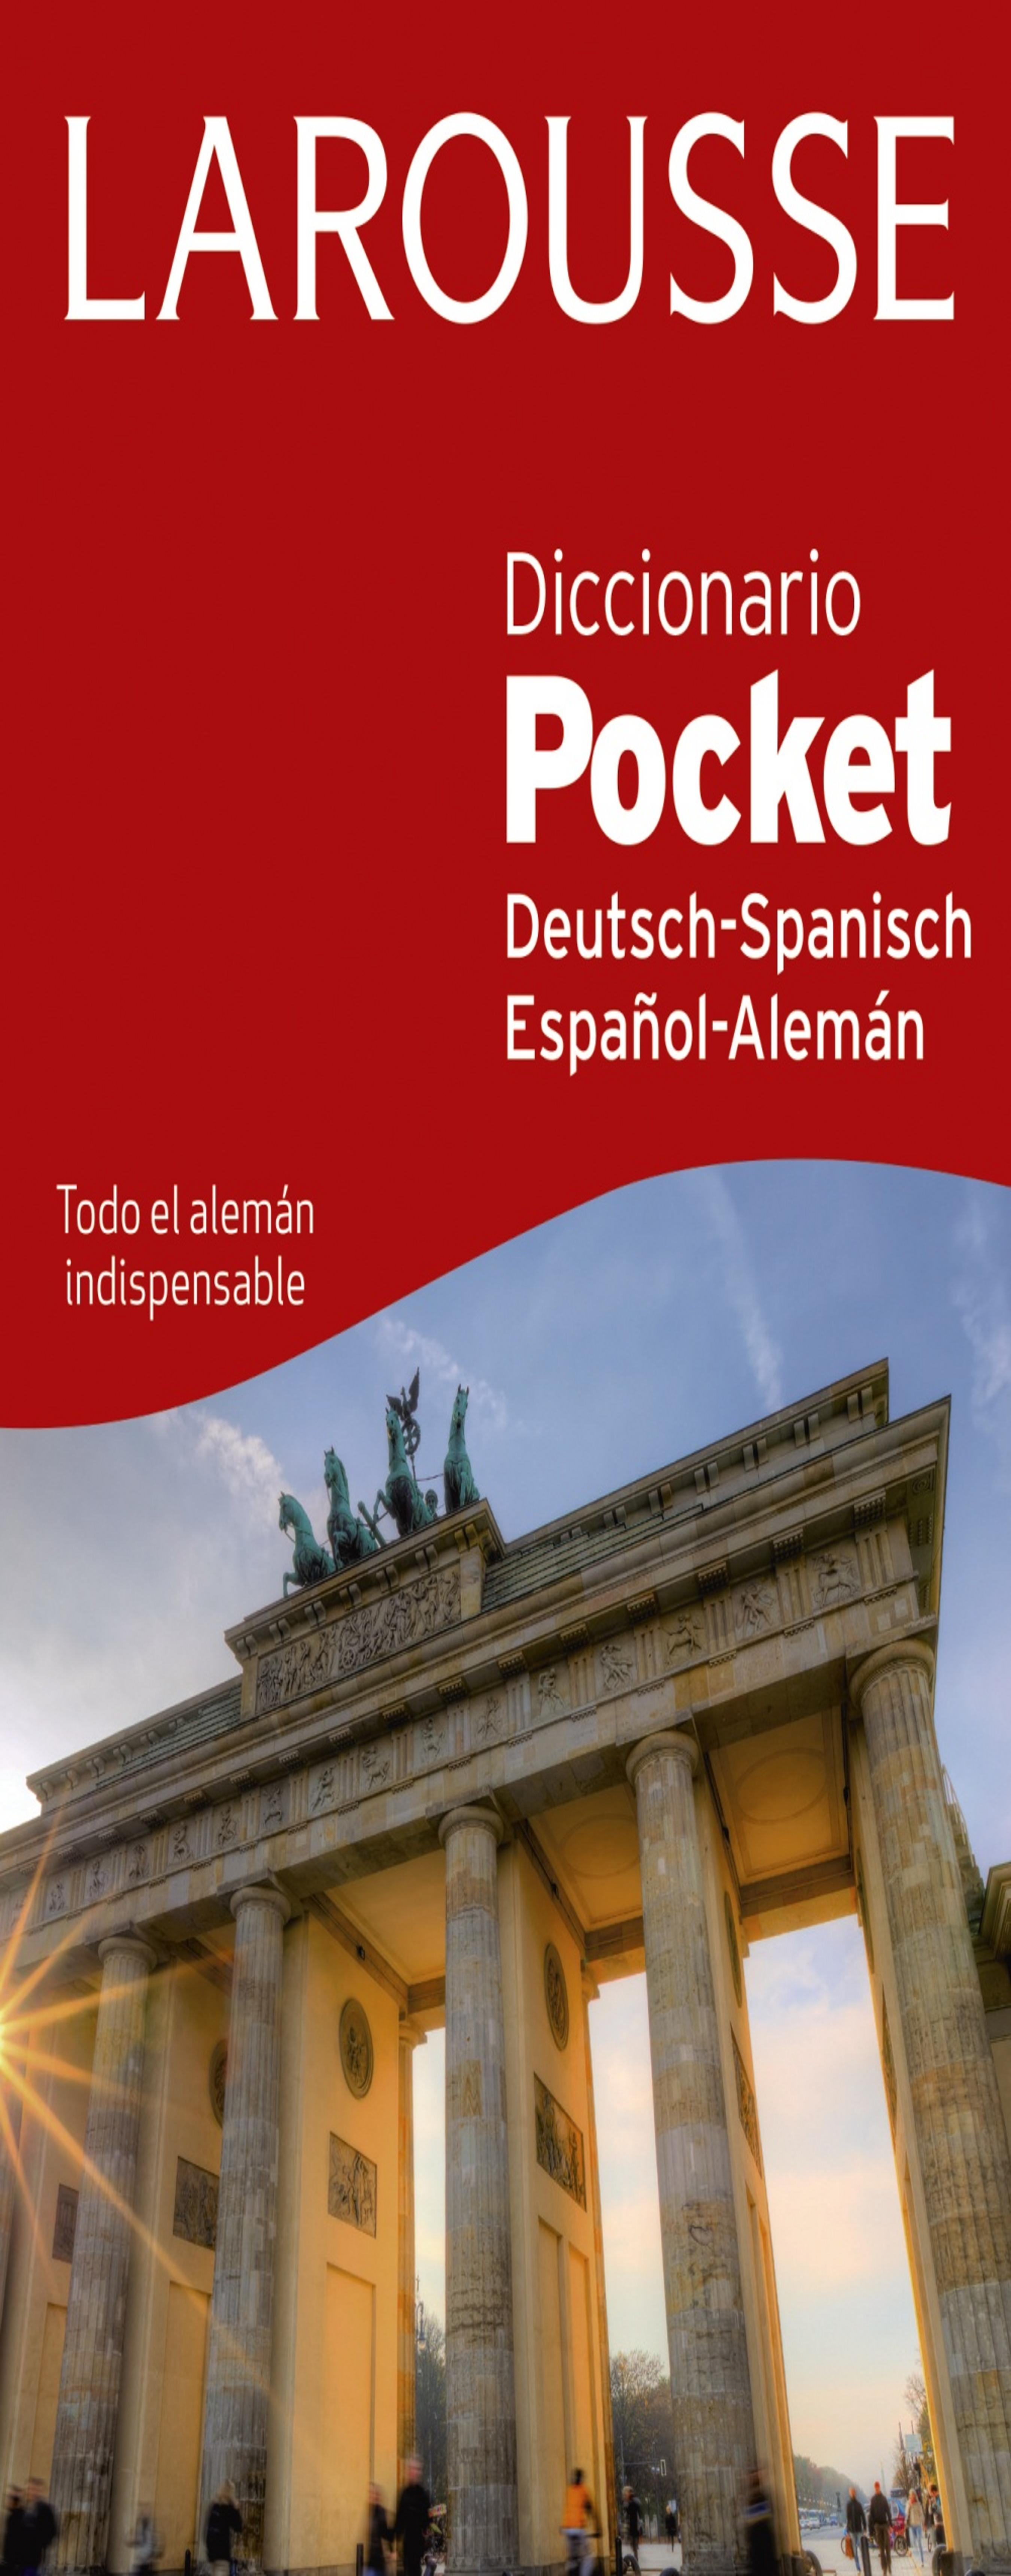 DICC Larousse POCKET Alemán - Español / Esp - Ale Ed 2016